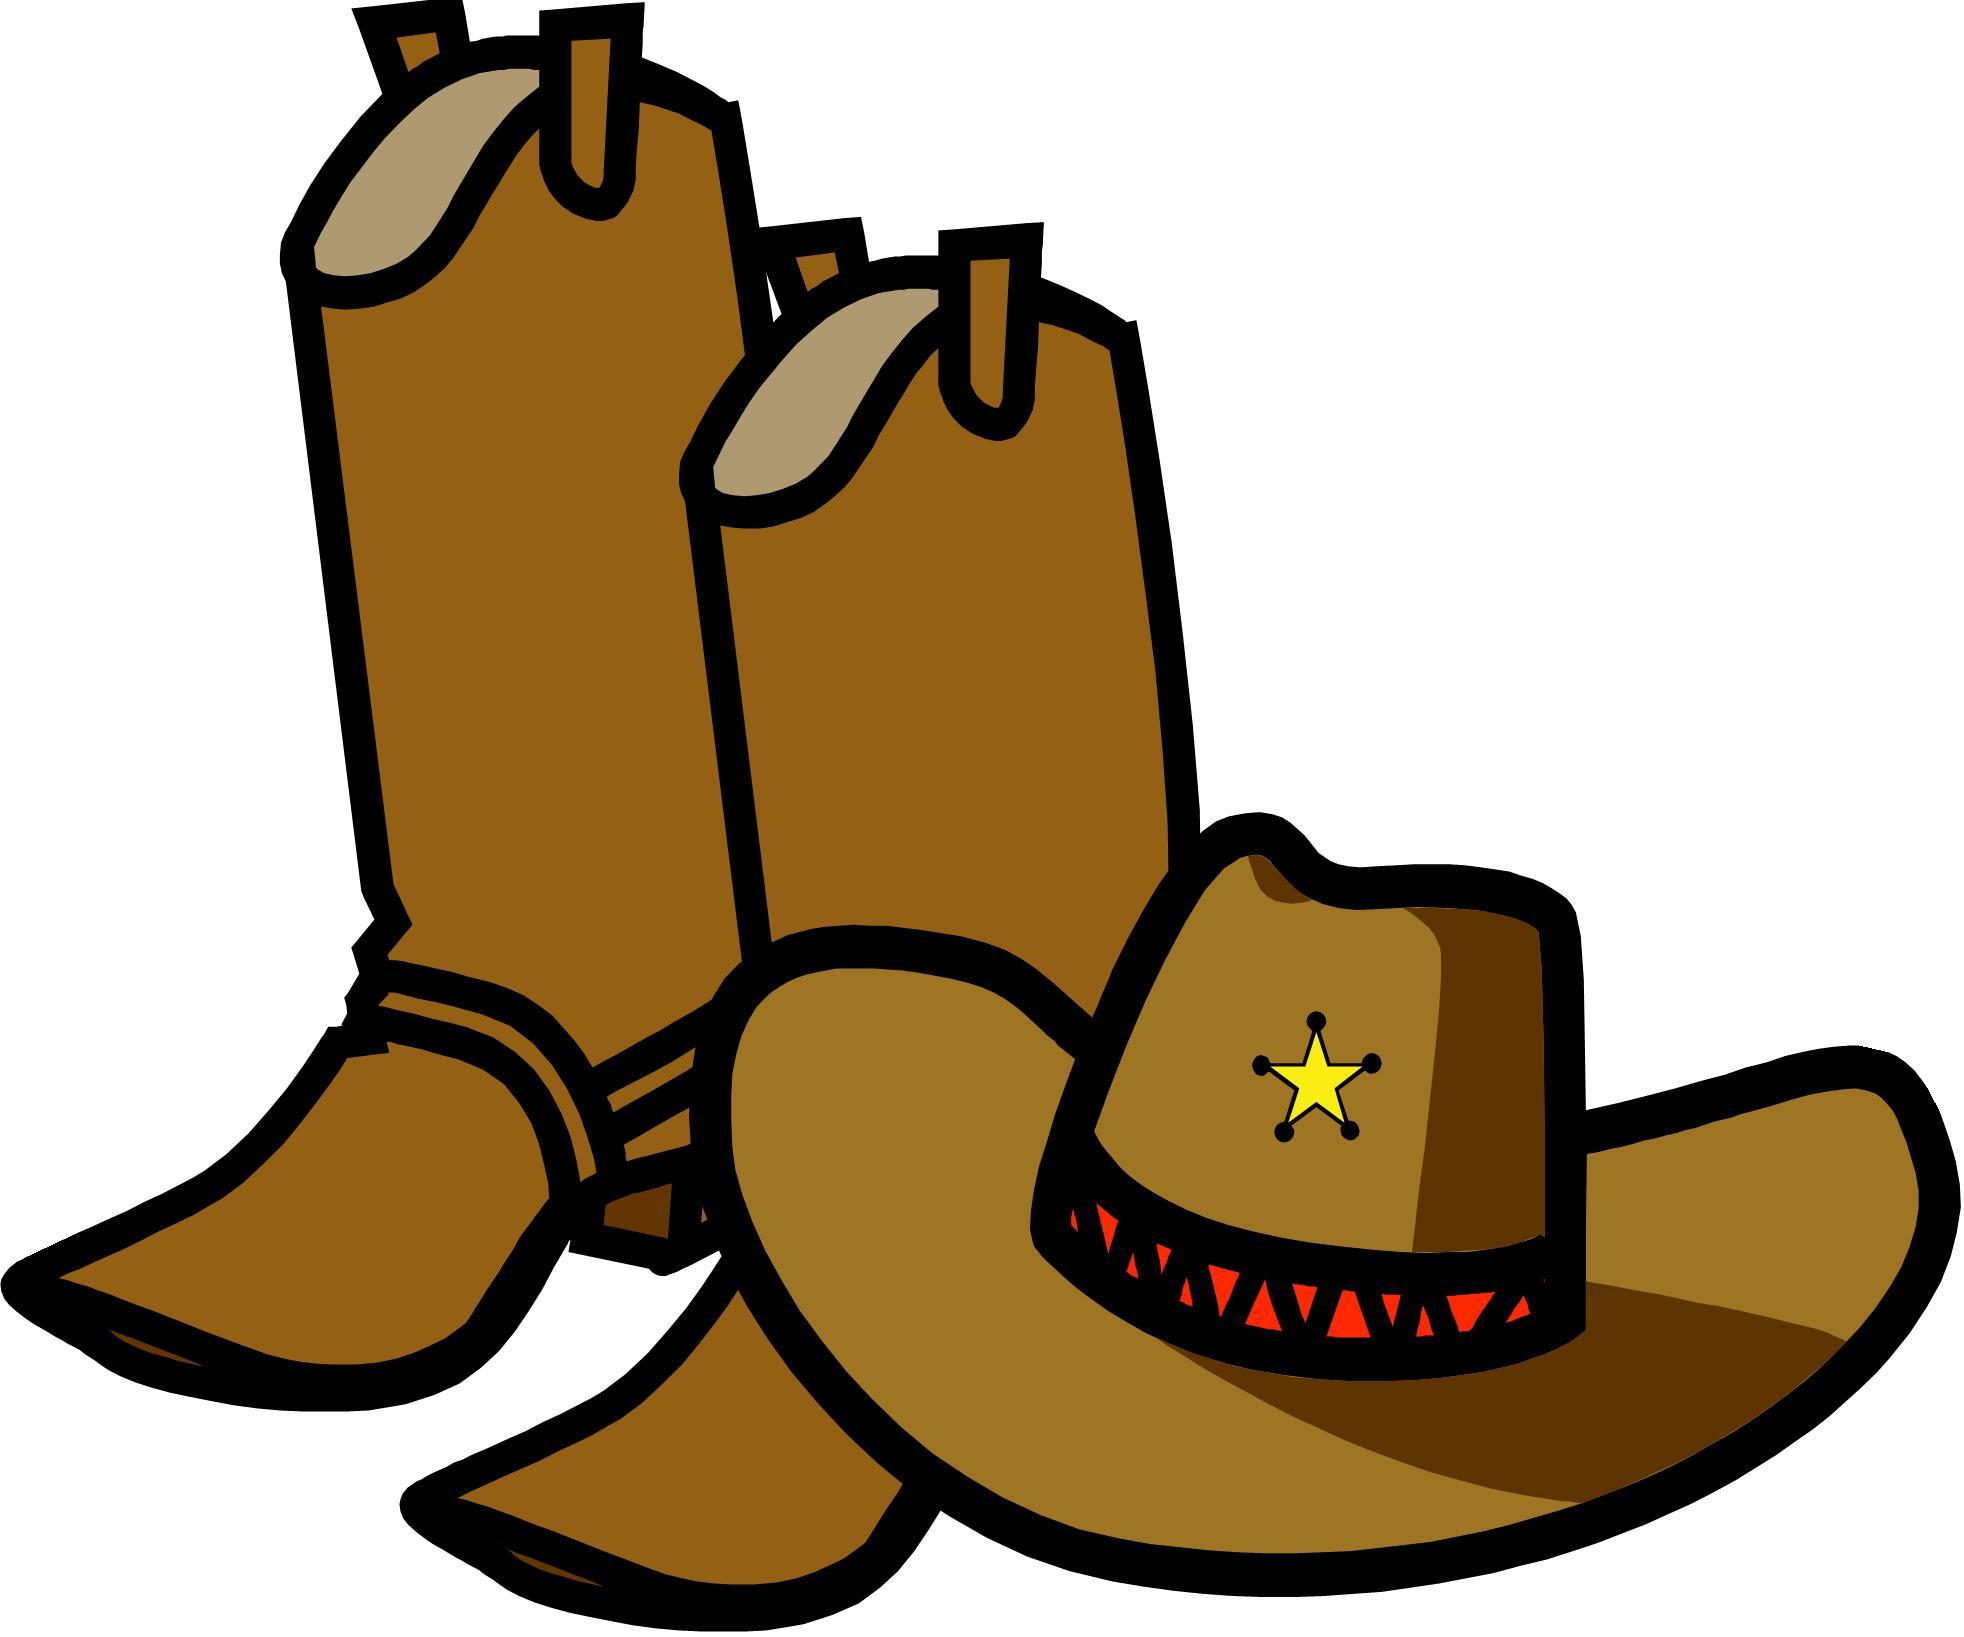 Baby Cowboy Boots Clipart-baby cowboy boots clipart-1